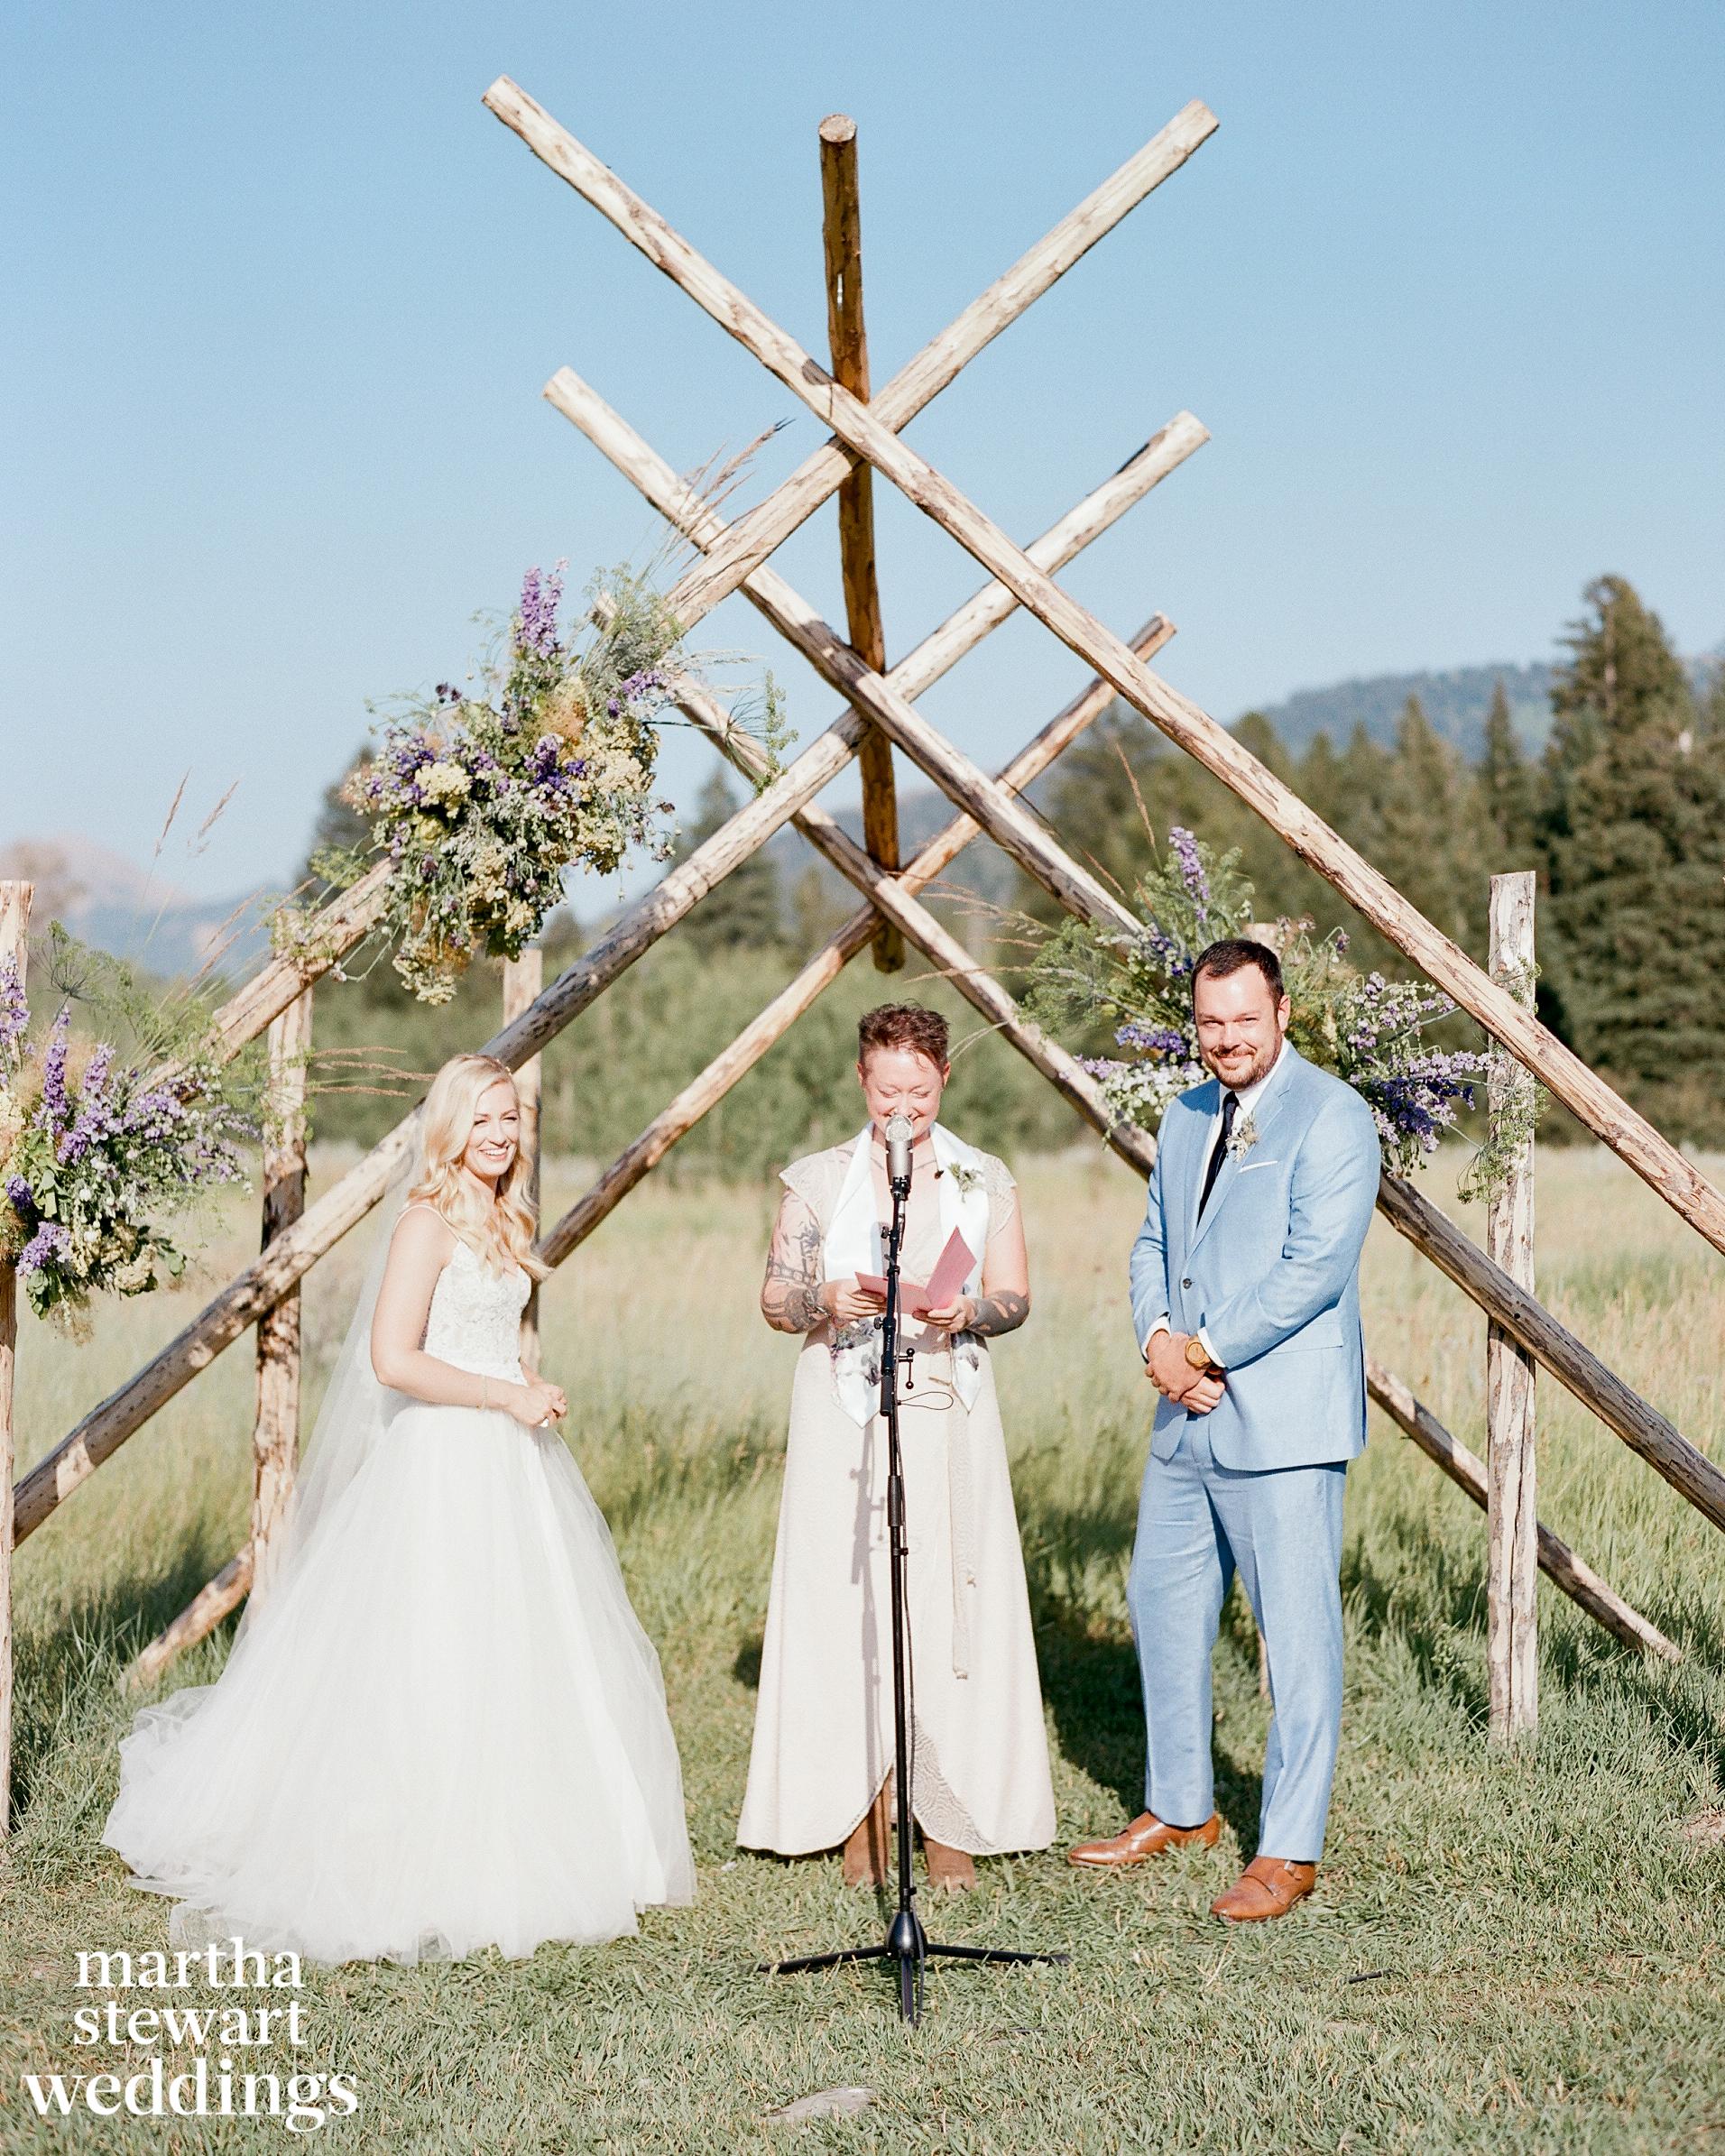 beth behrs michael gladis wedding ceremony sylvie gil